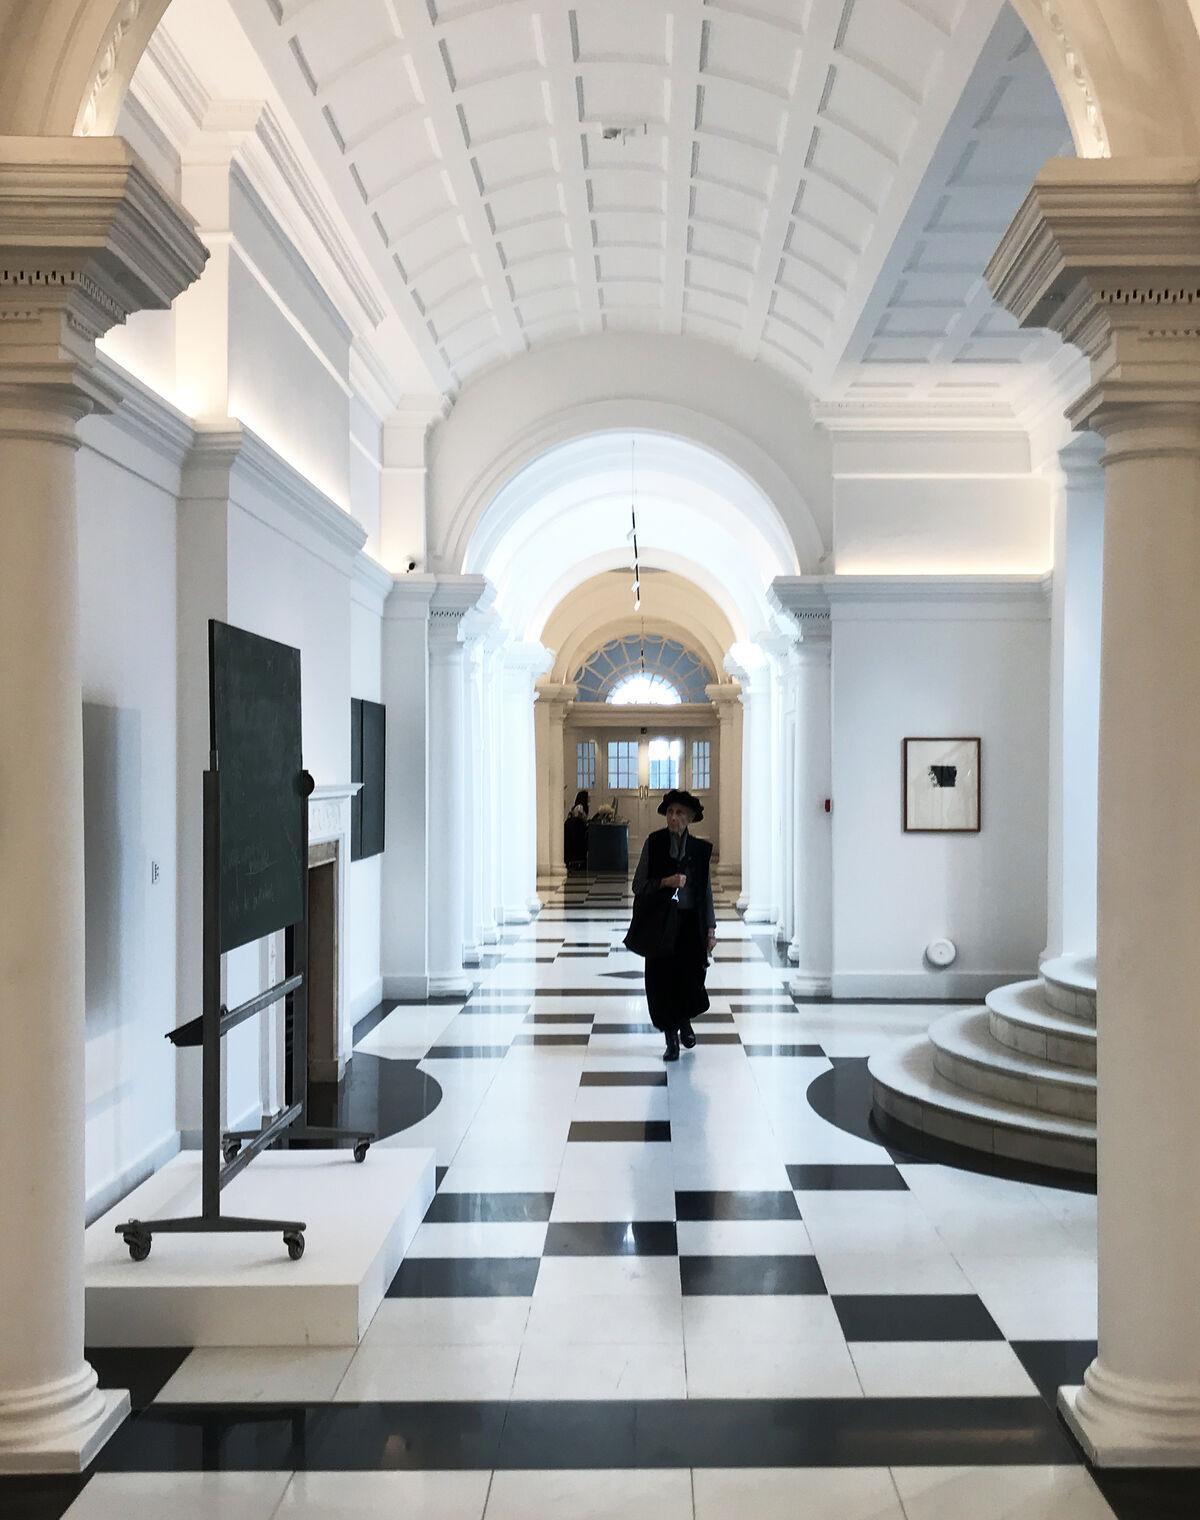 Galerie Thaddaeus Ropac, Ely House, London. Photo by Steve Bowbrick, via Flickr.